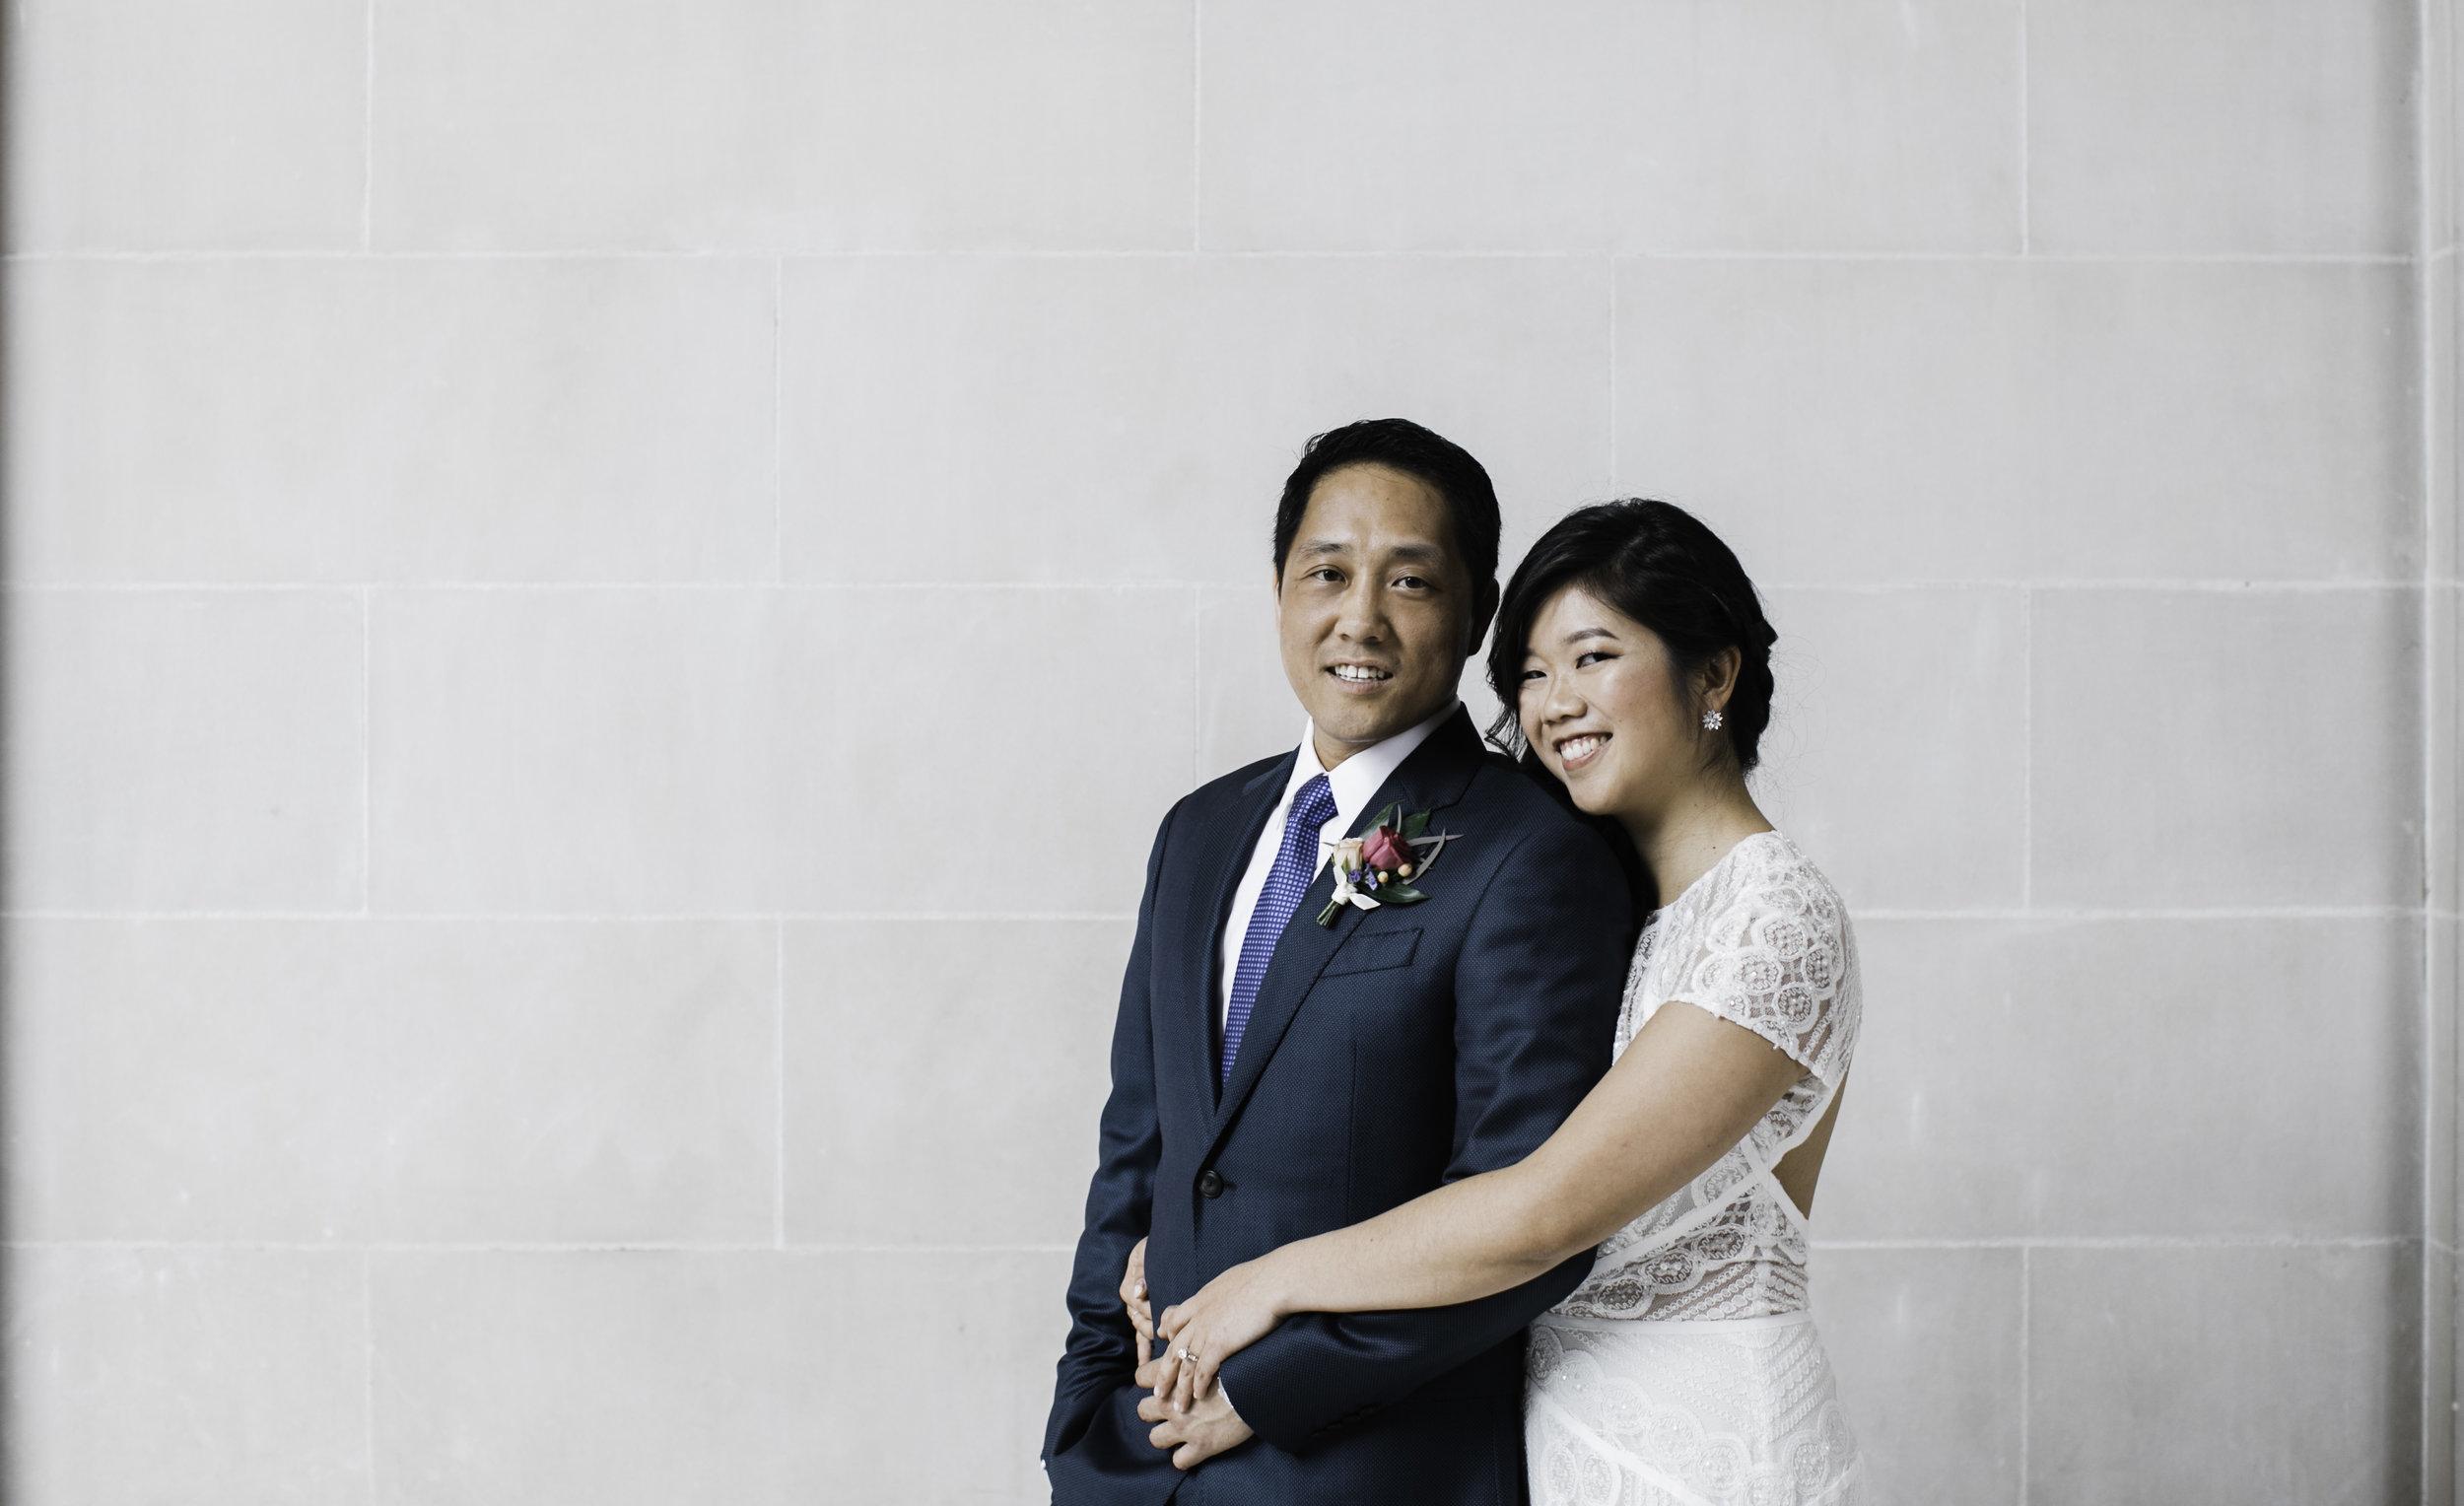 032118_M+D City Hall Wedding_Buena Lane Photography_0470.jpg